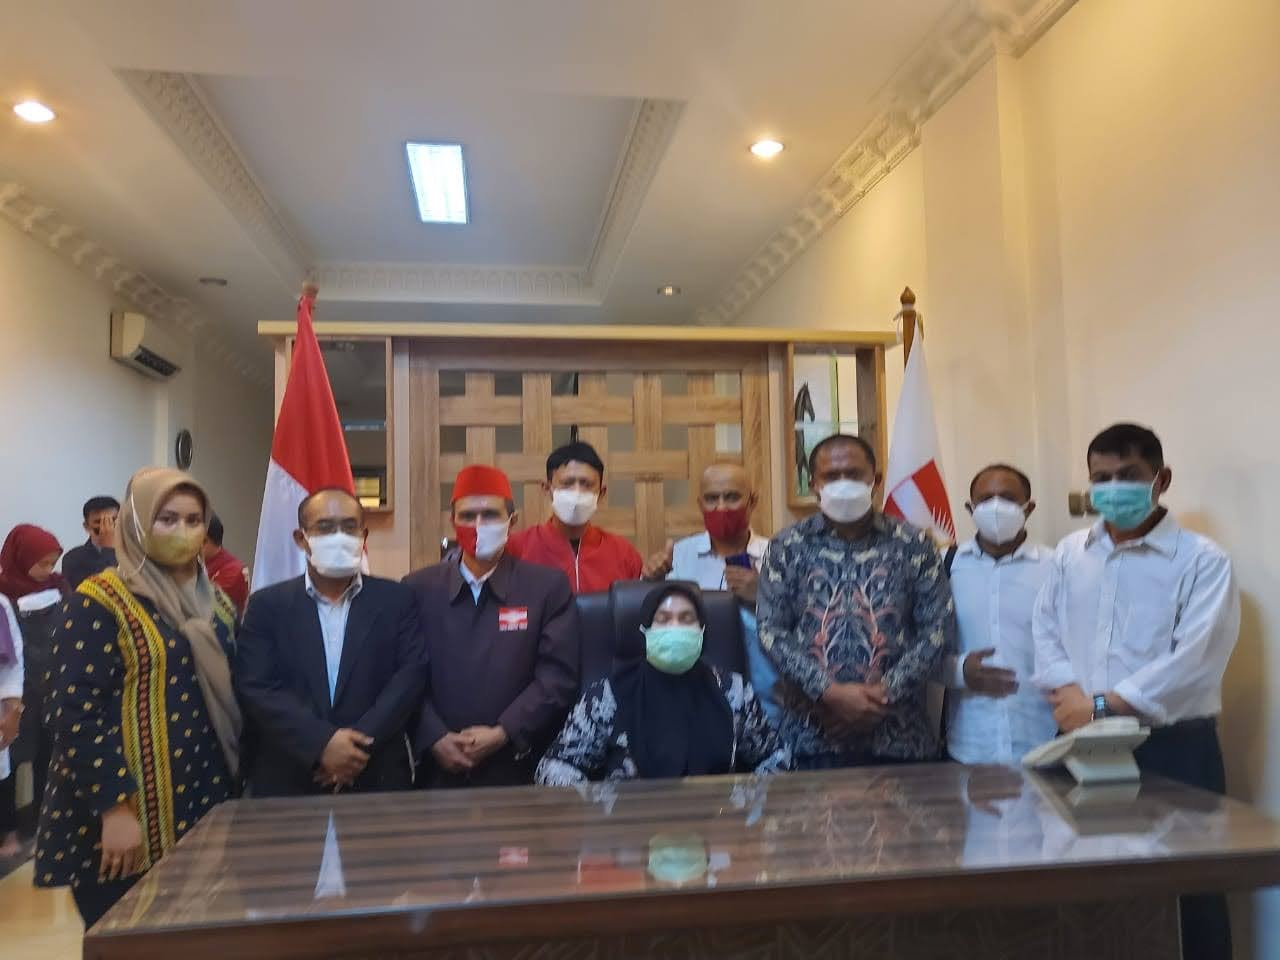 Resmi Berbadan Hukum Partai Indonesia Terang Siap Berkibar